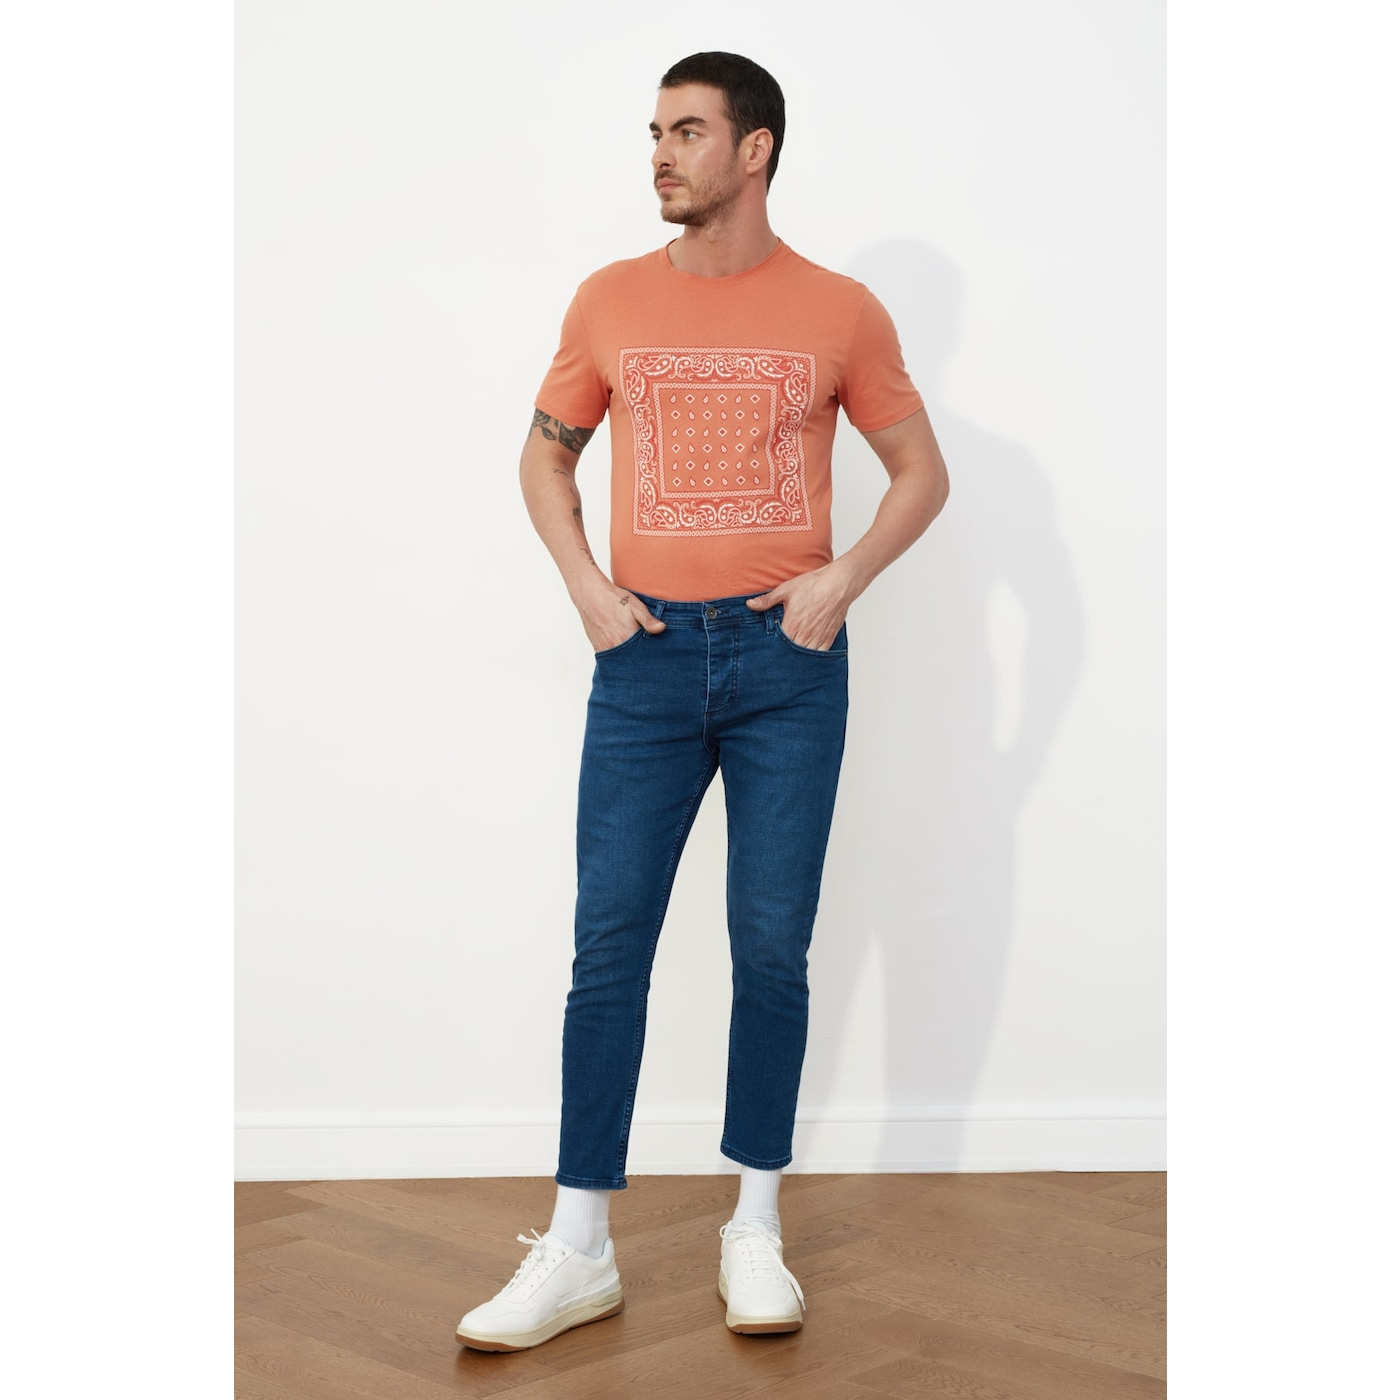 Trendyol Outdoor Navy Blue Male Skinny Crop Jeans AÇIK LACİVERT 31